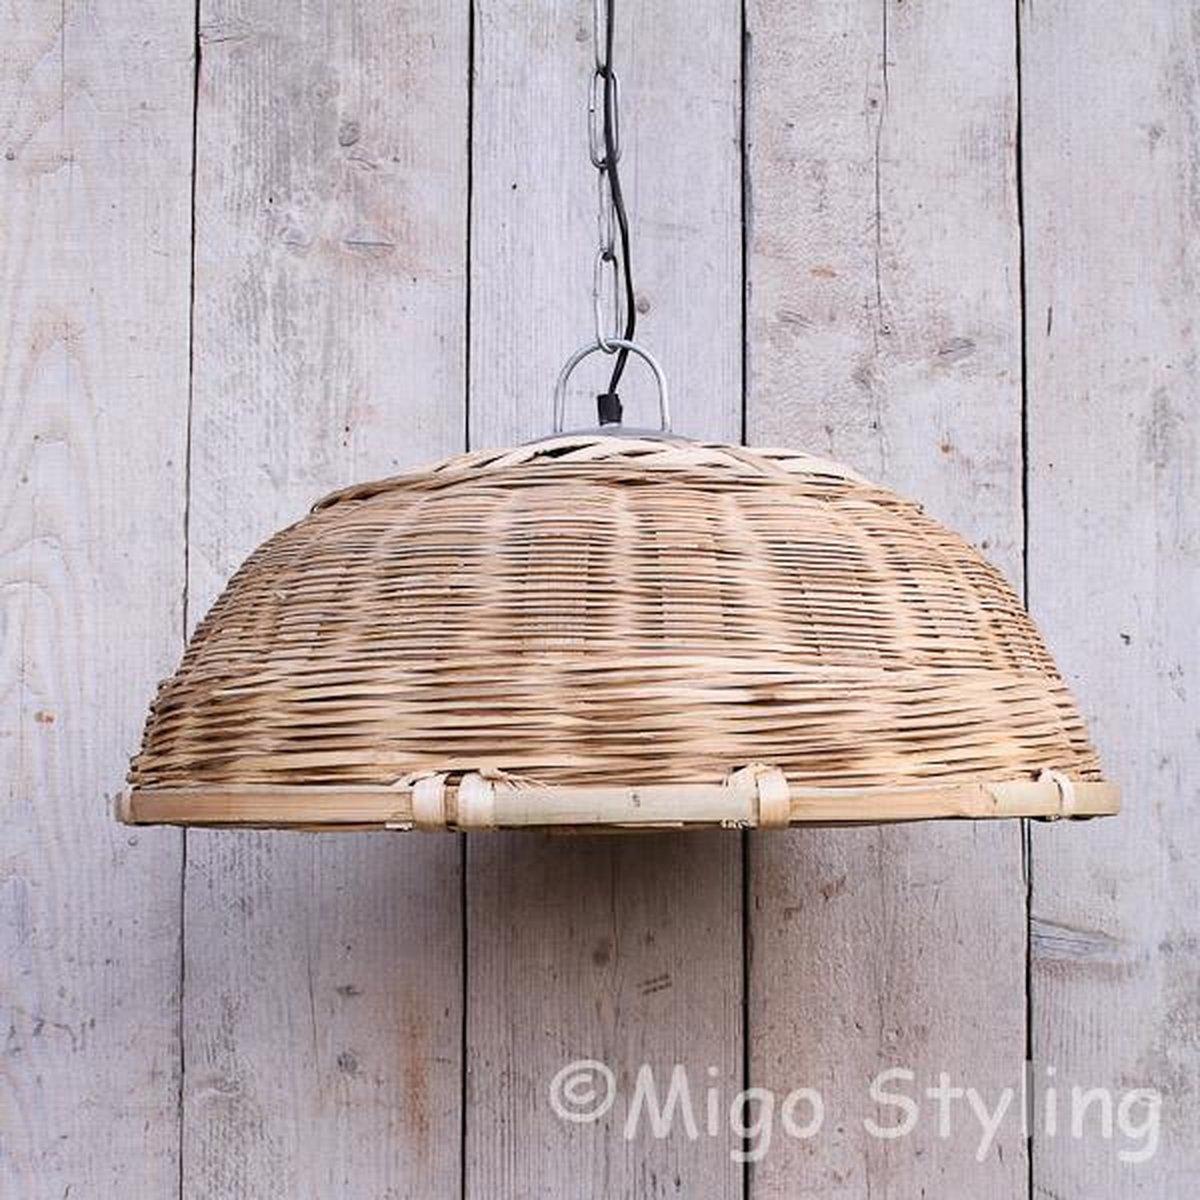 Hanglamp-Riet-Bamboe-Ijzer-Naturel-Tuin-Overkapping-Dia 58 cm